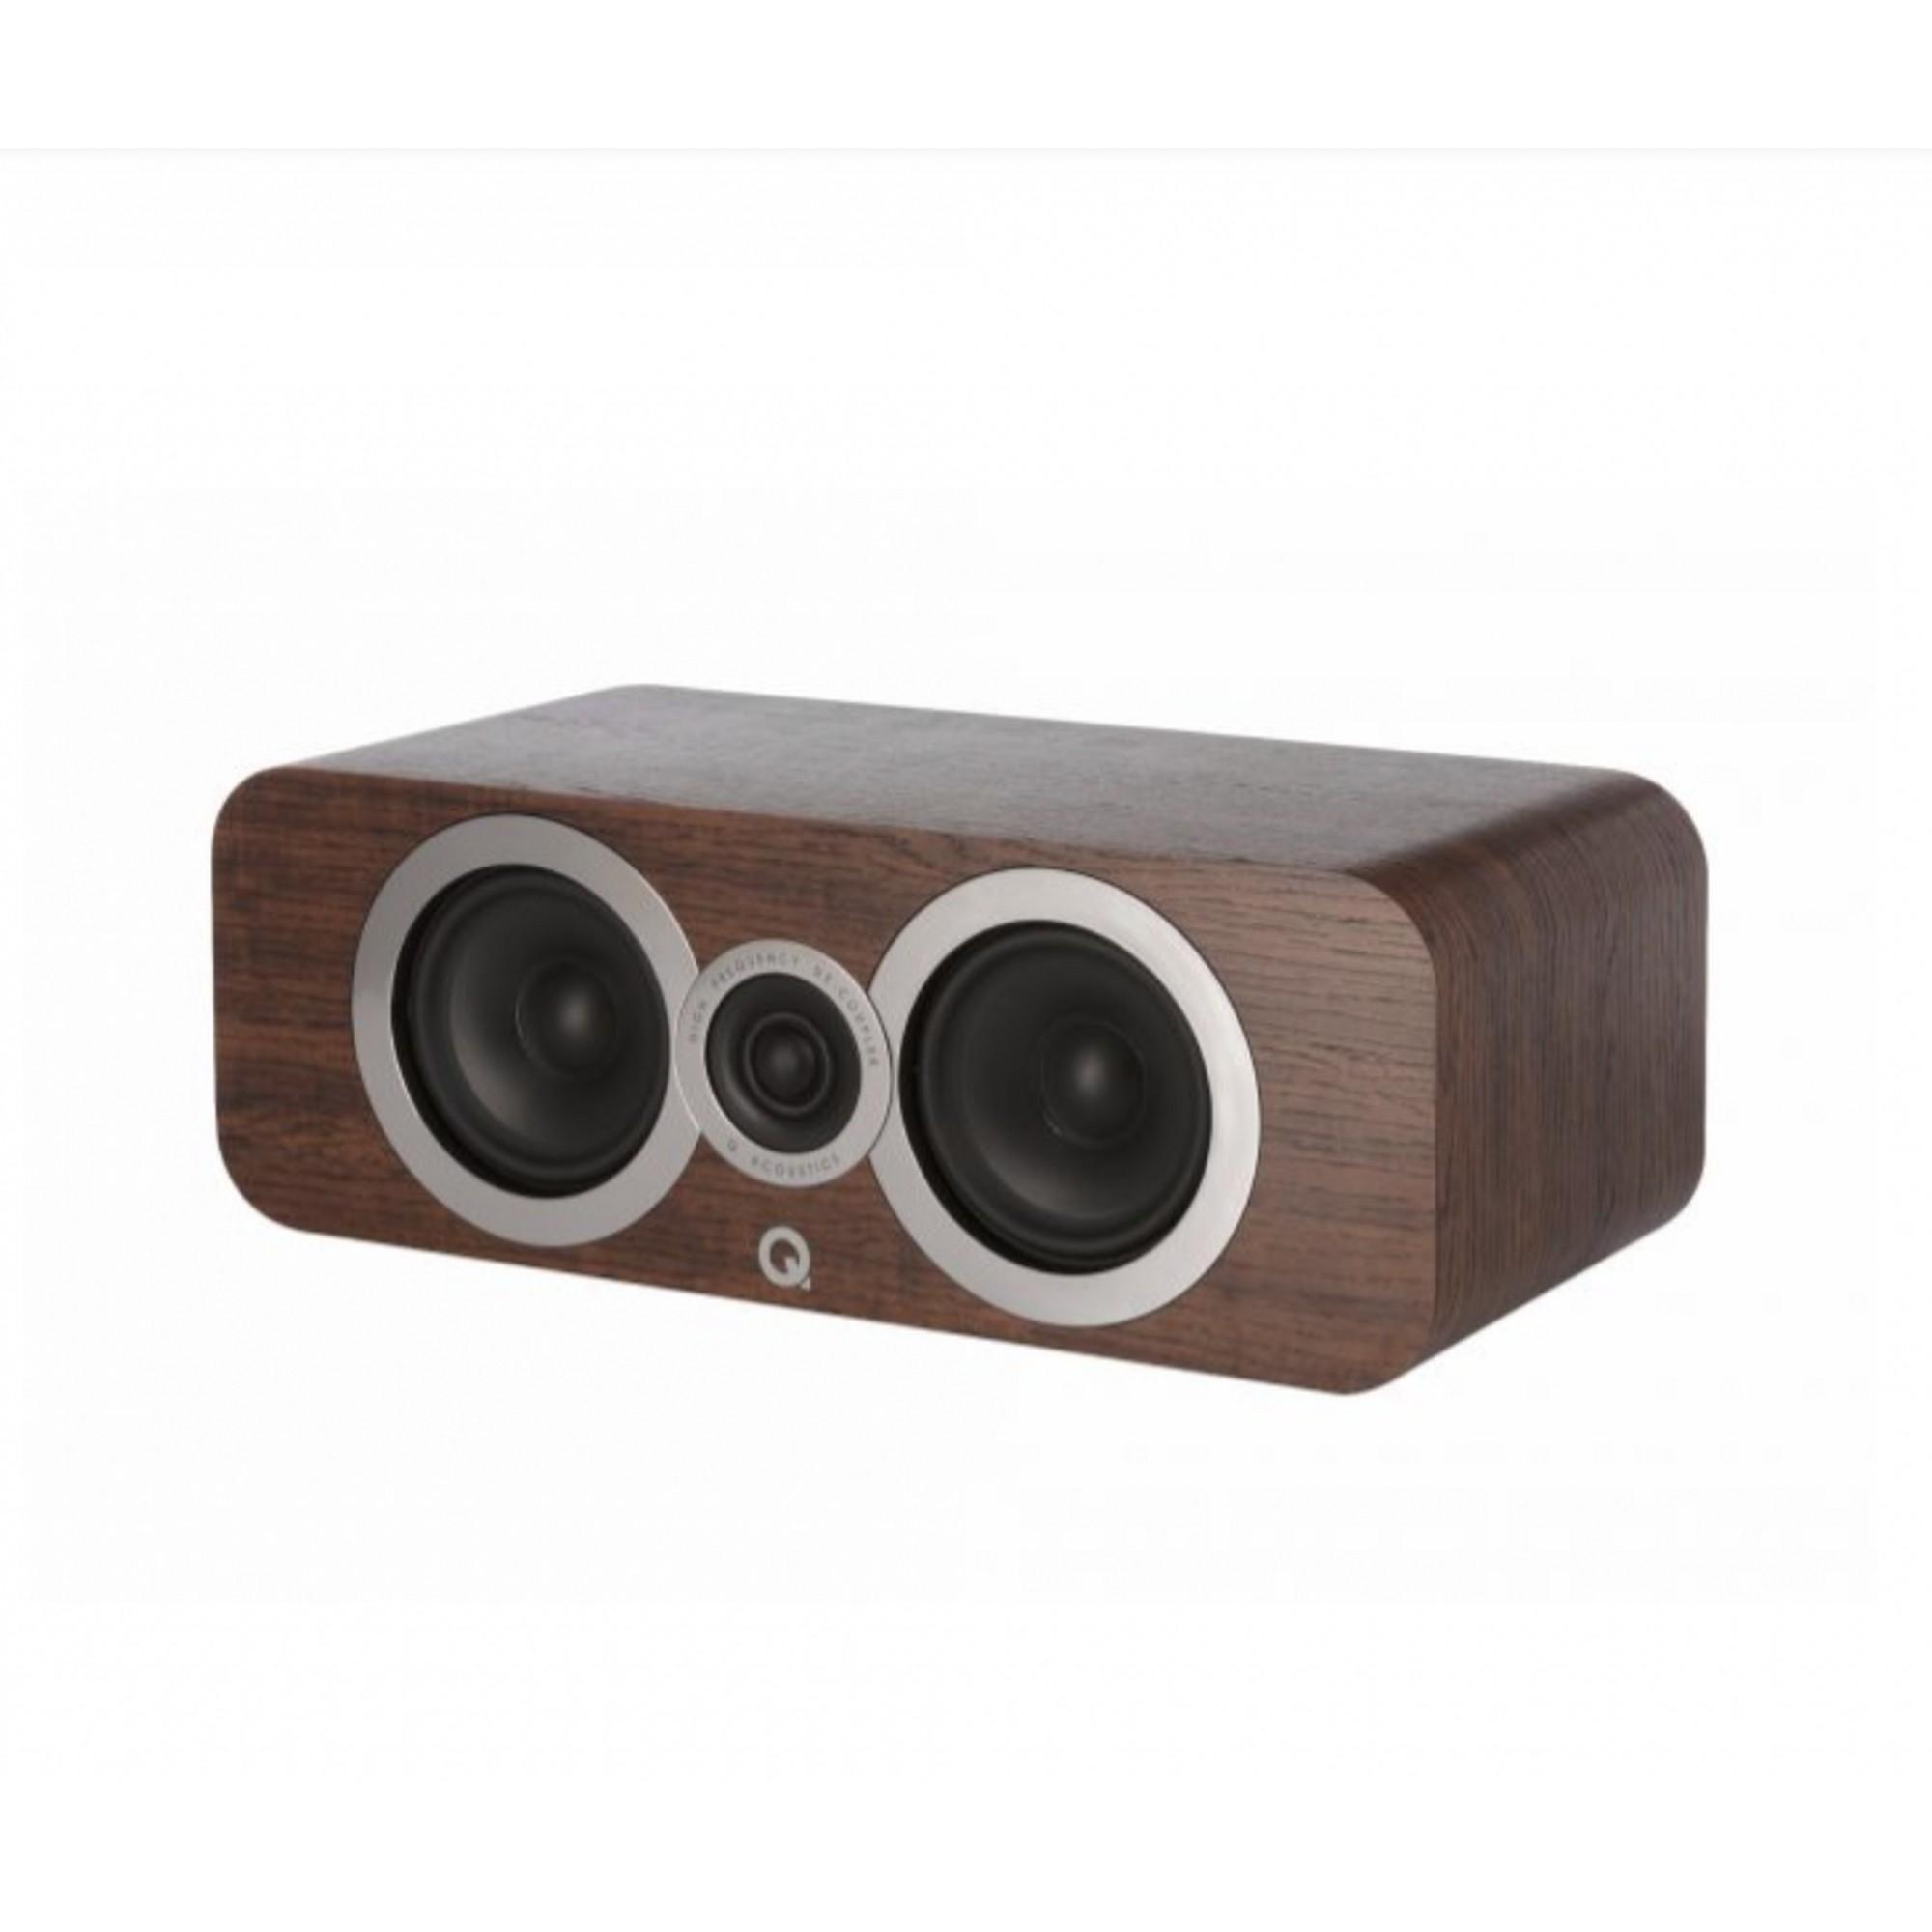 Q Acoustics Q3090ci - Caixa Central Home Theater